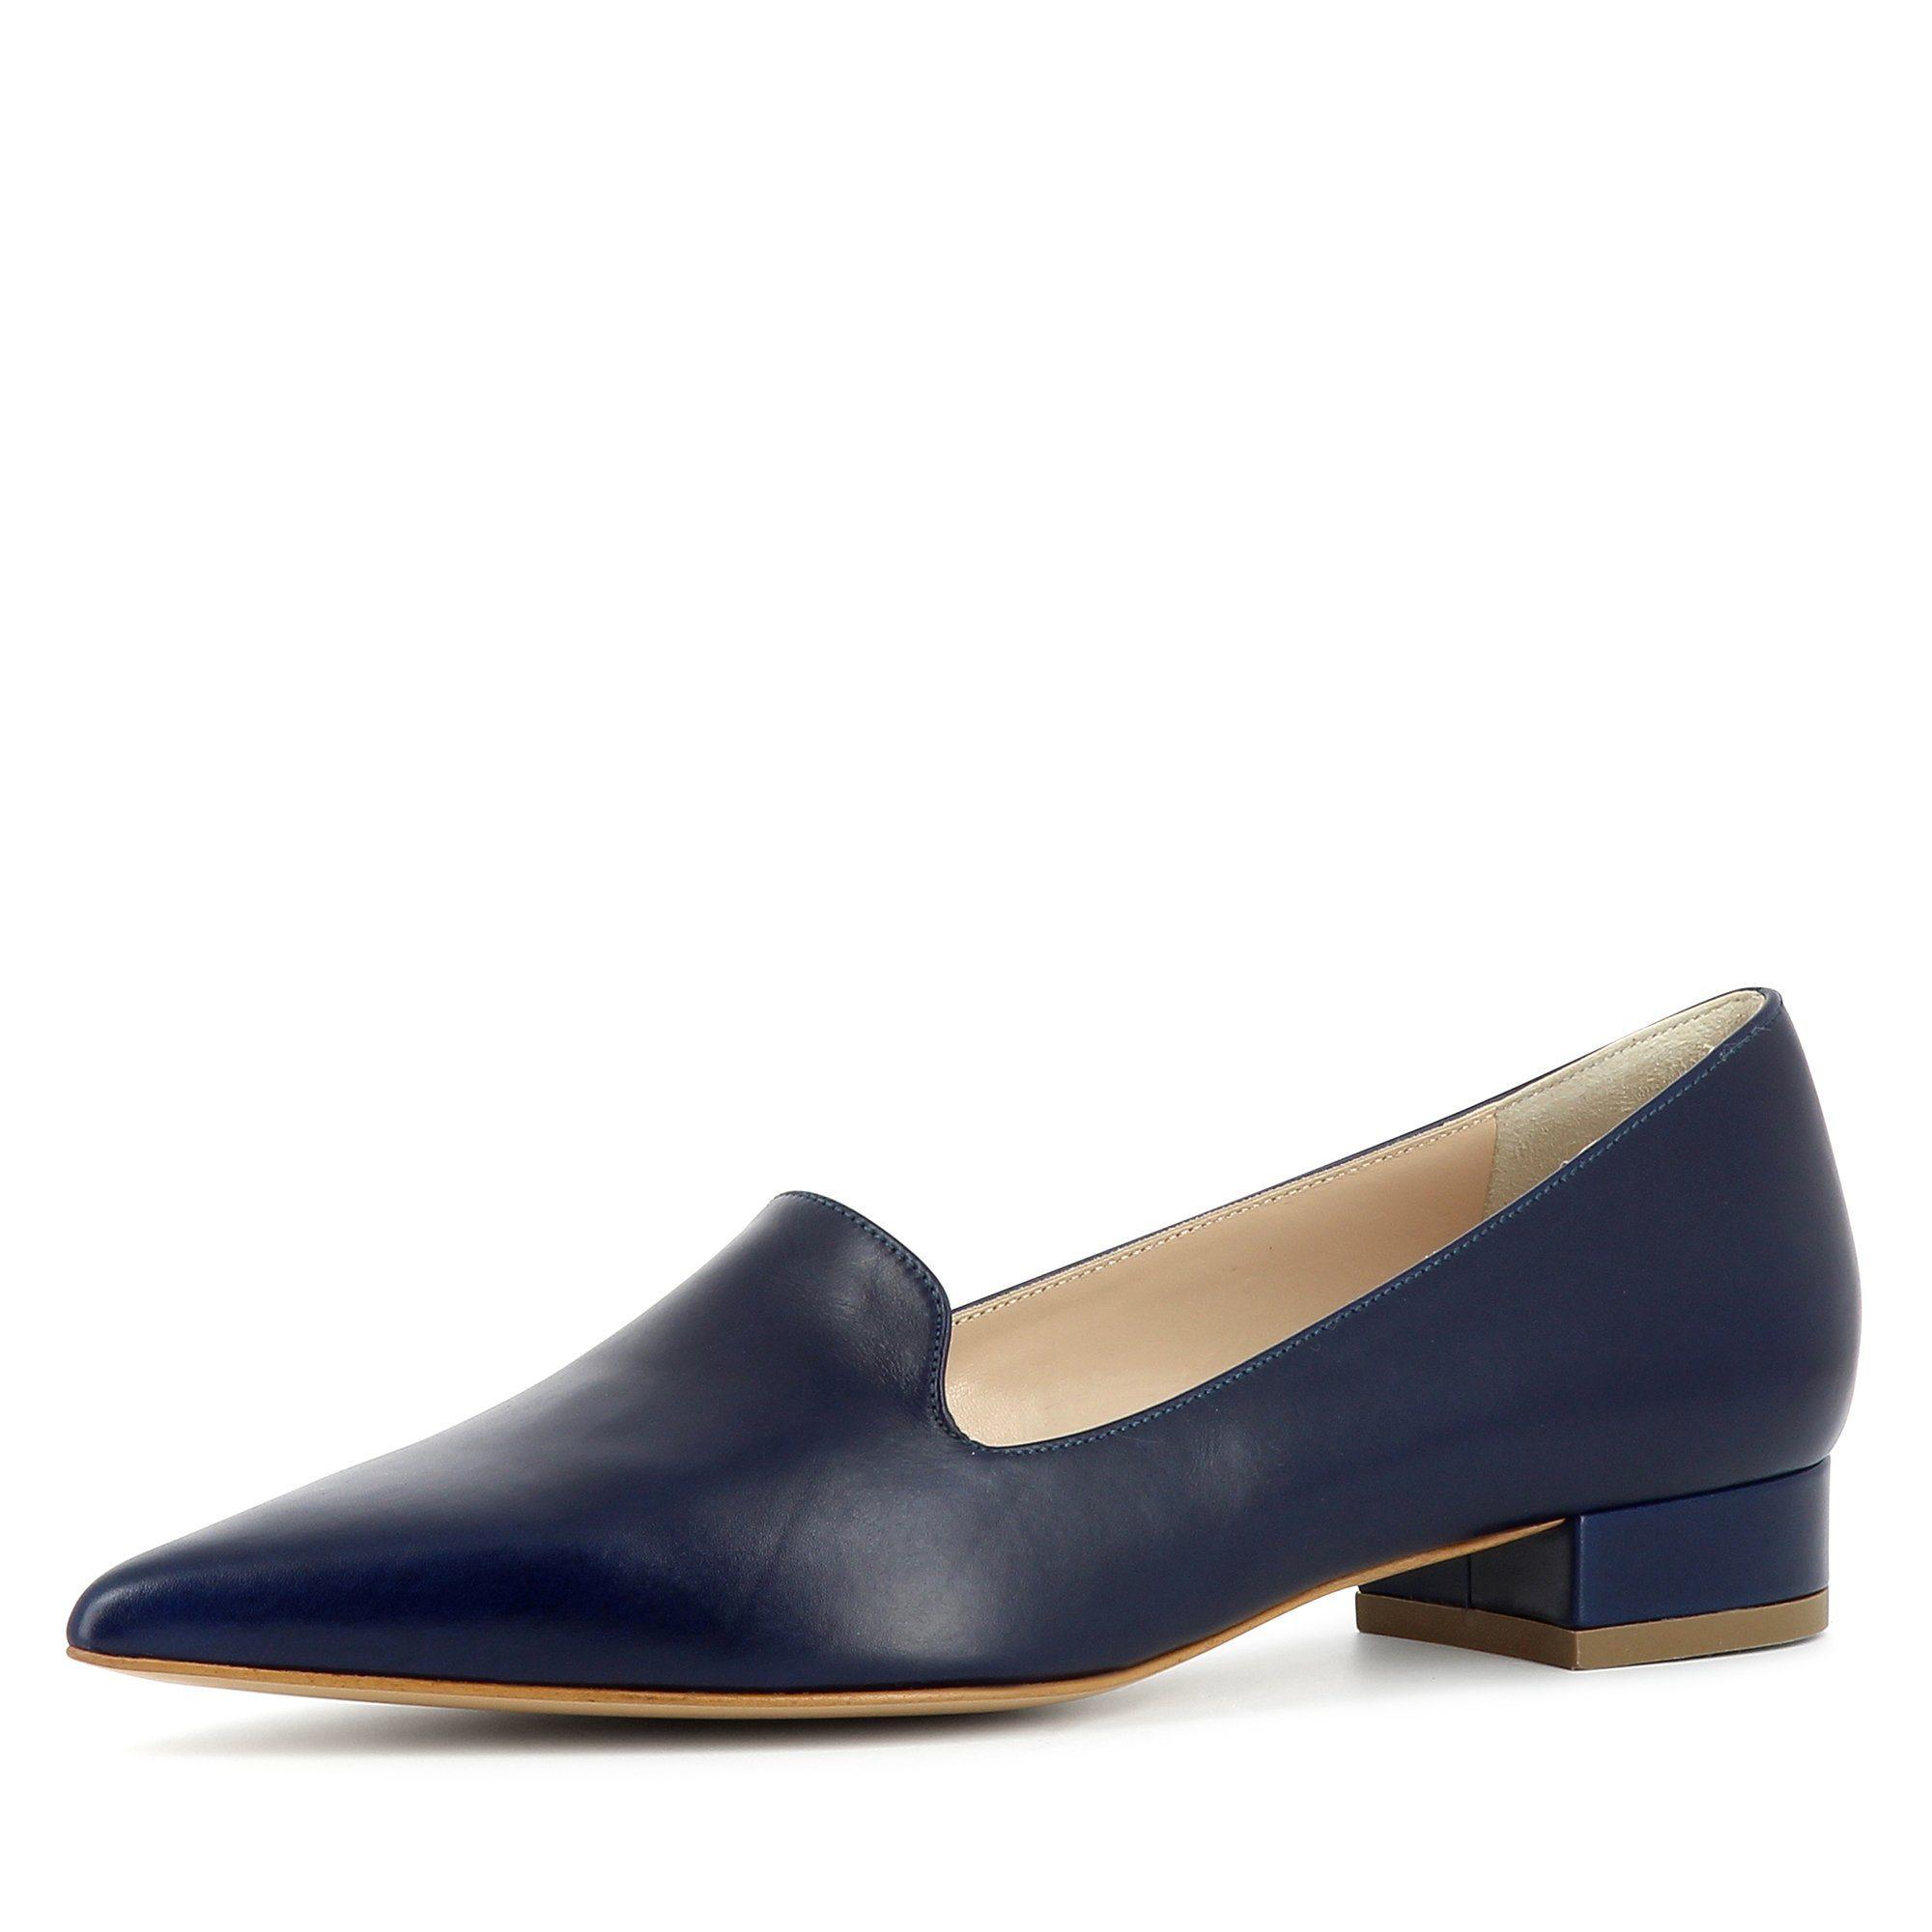 Evita FRANCA Slipper online kaufen  blau